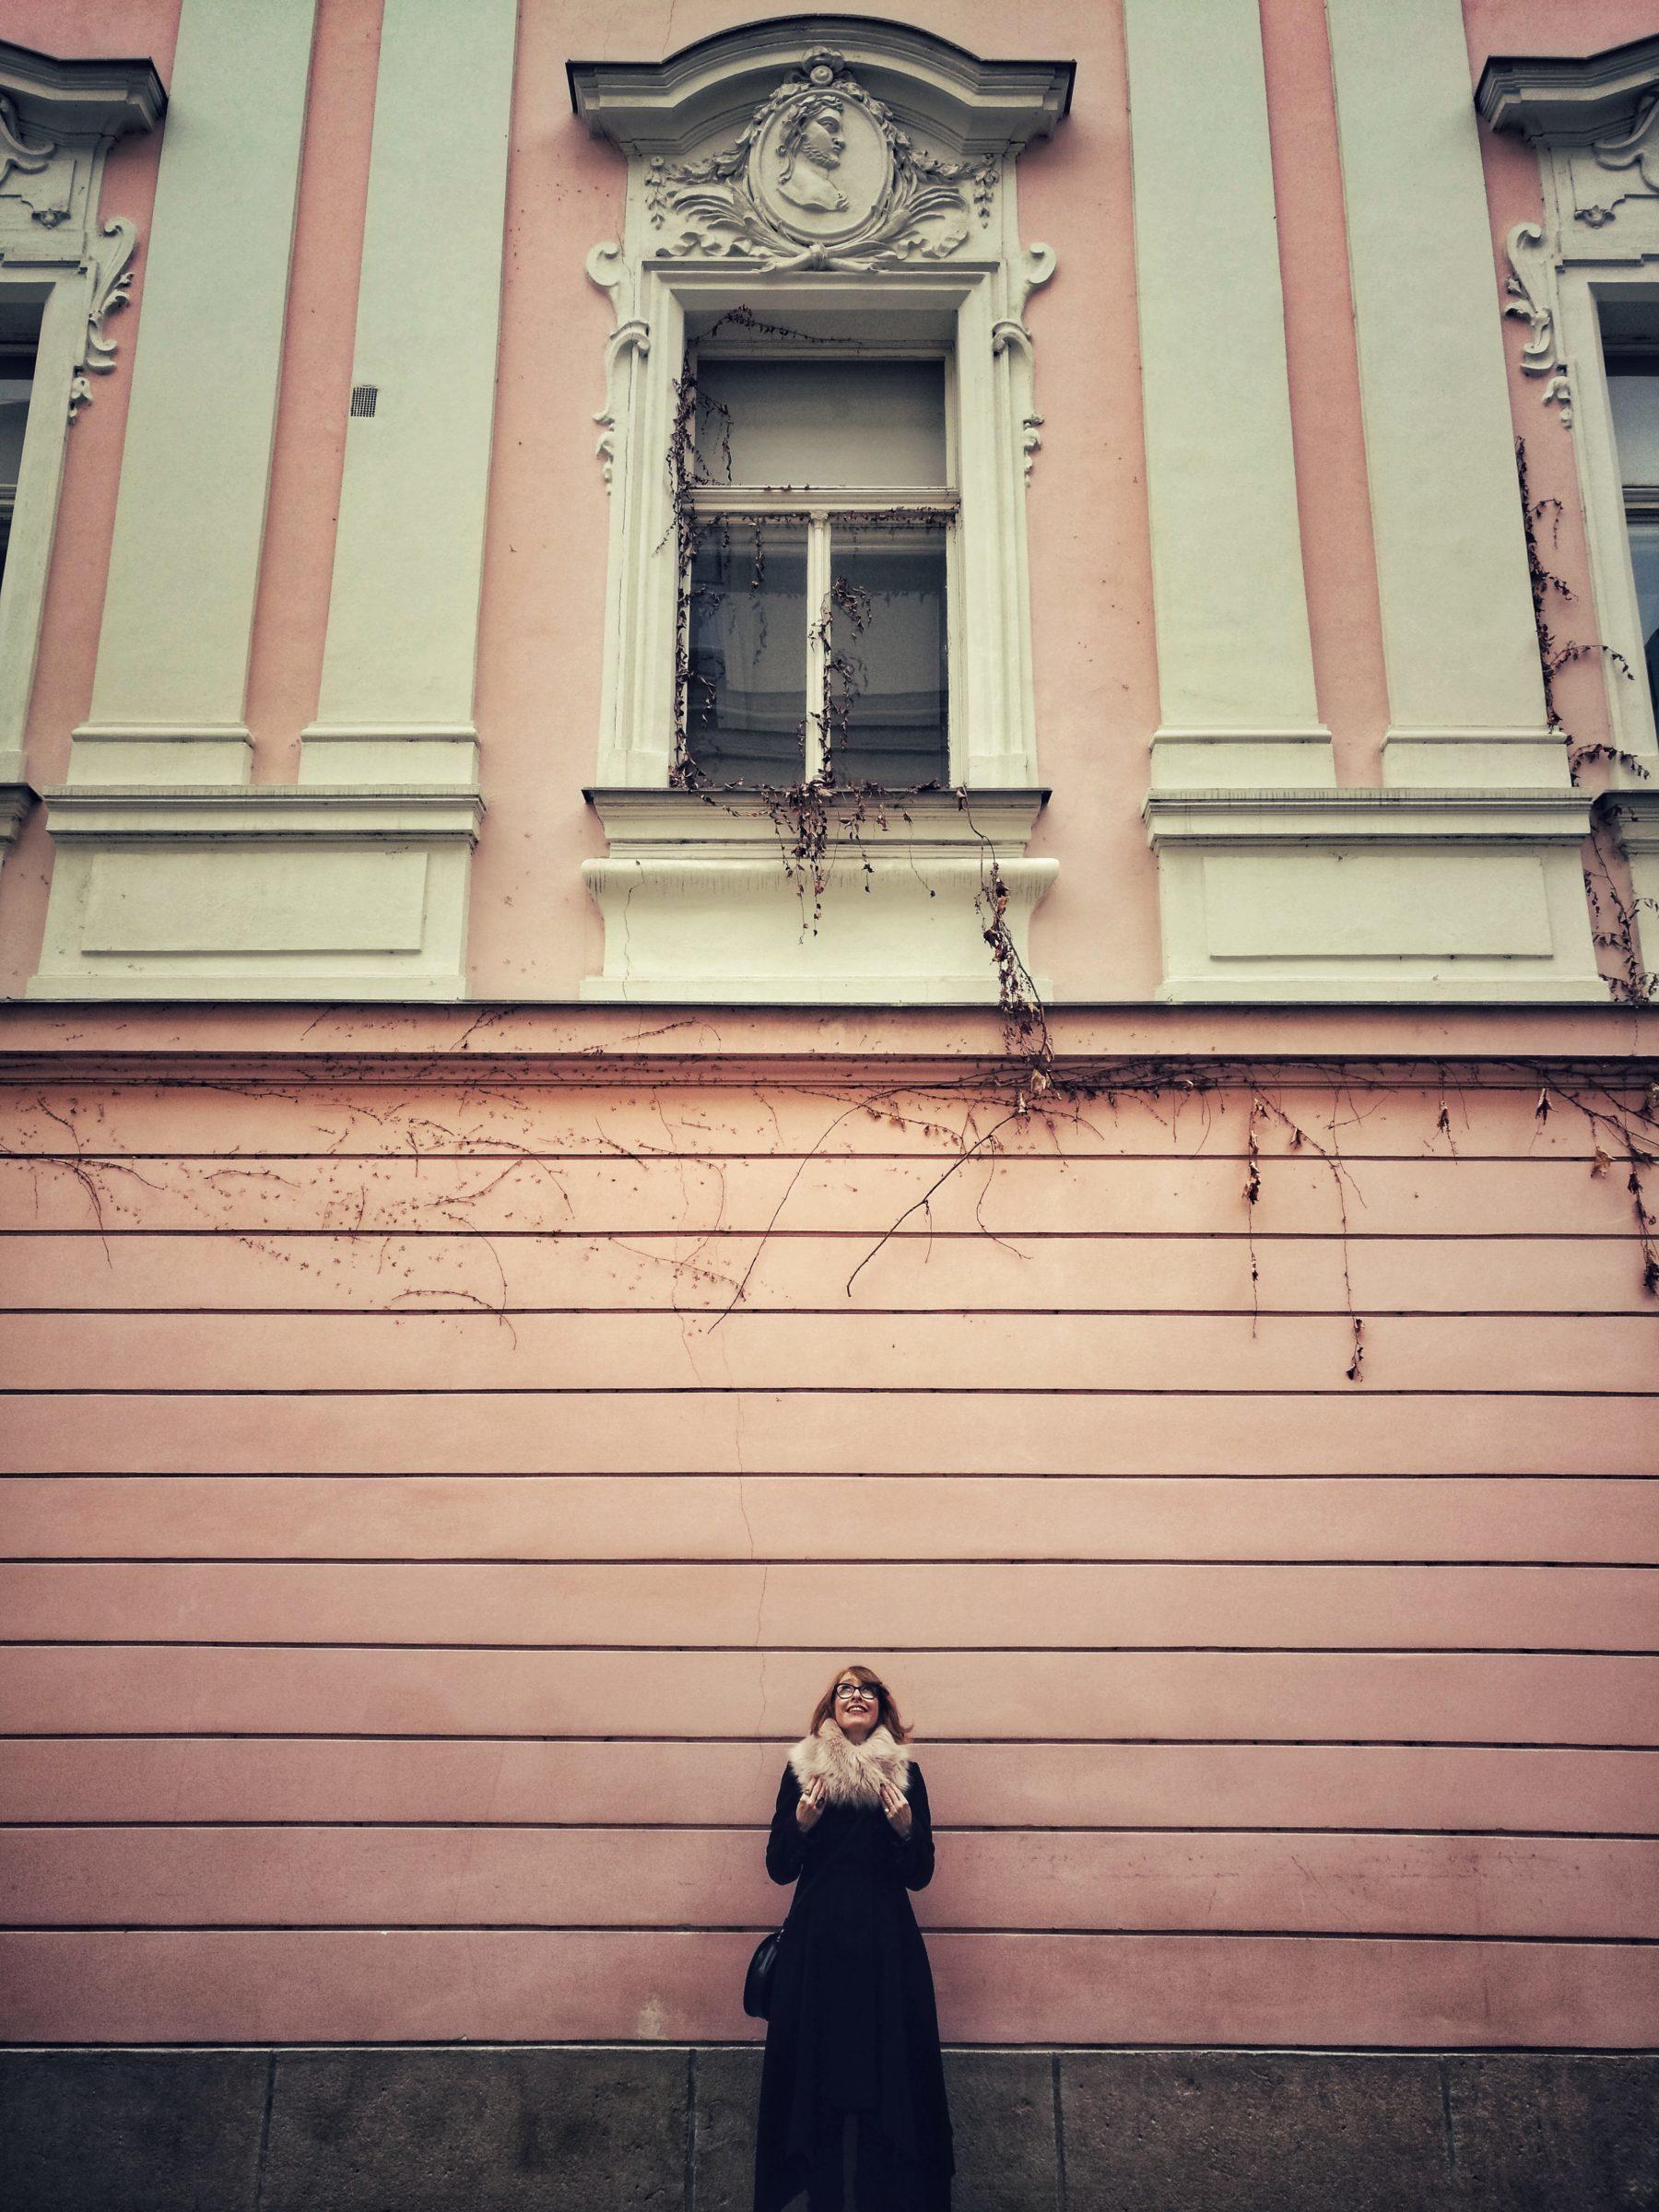 Blossom zine Praga in 4 giorni